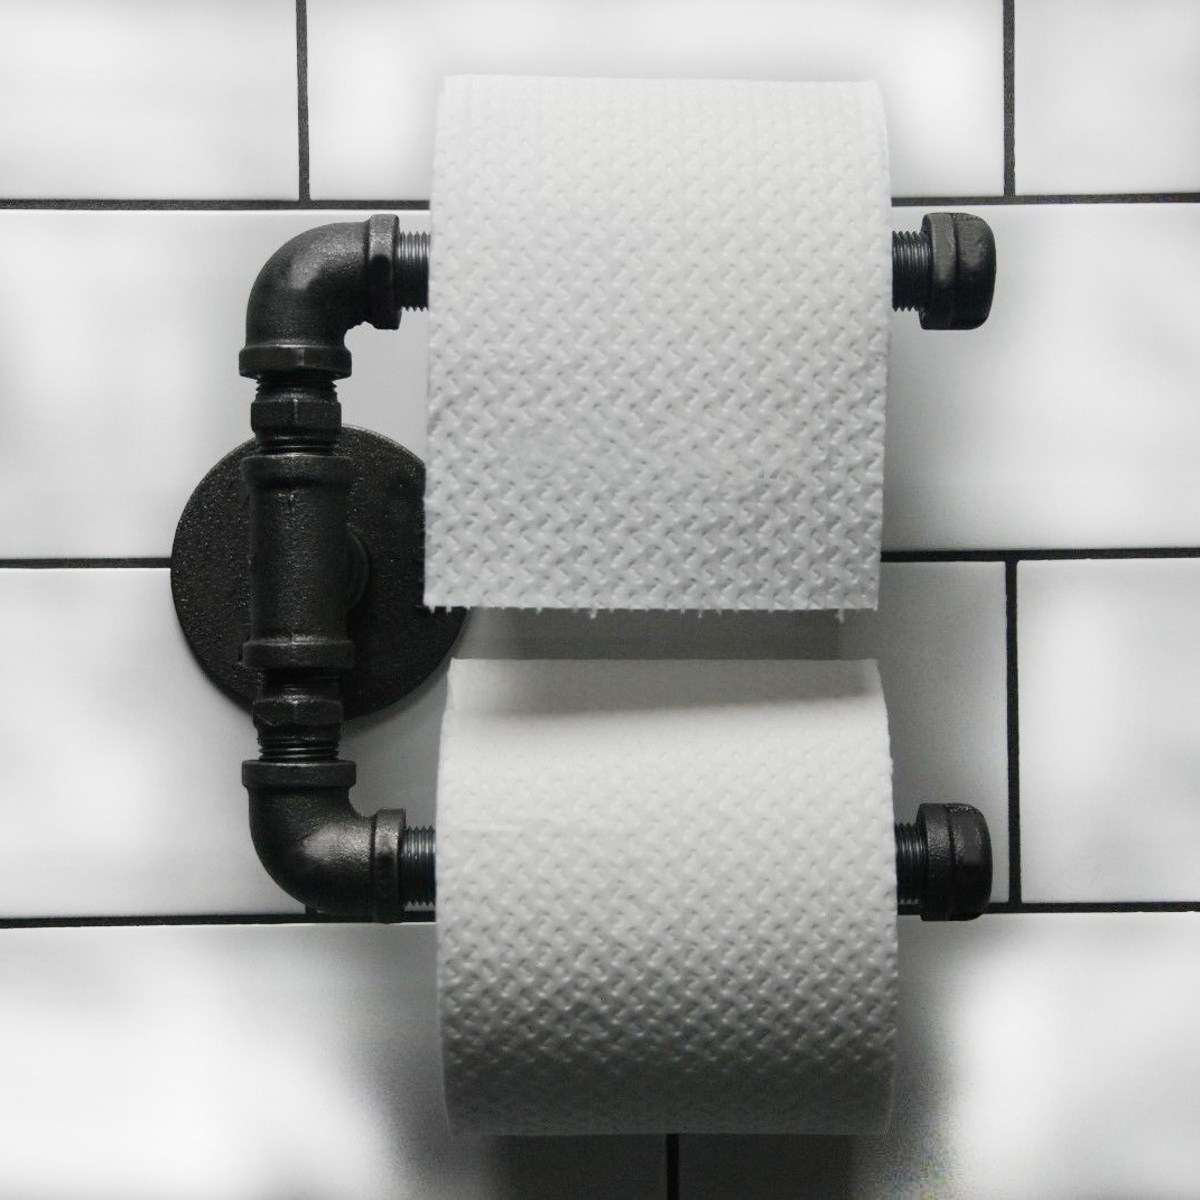 Urban Industrial Style Bathroom Paper Holder Hanger Tissue Roll Towel Rack Iron Wall Mount